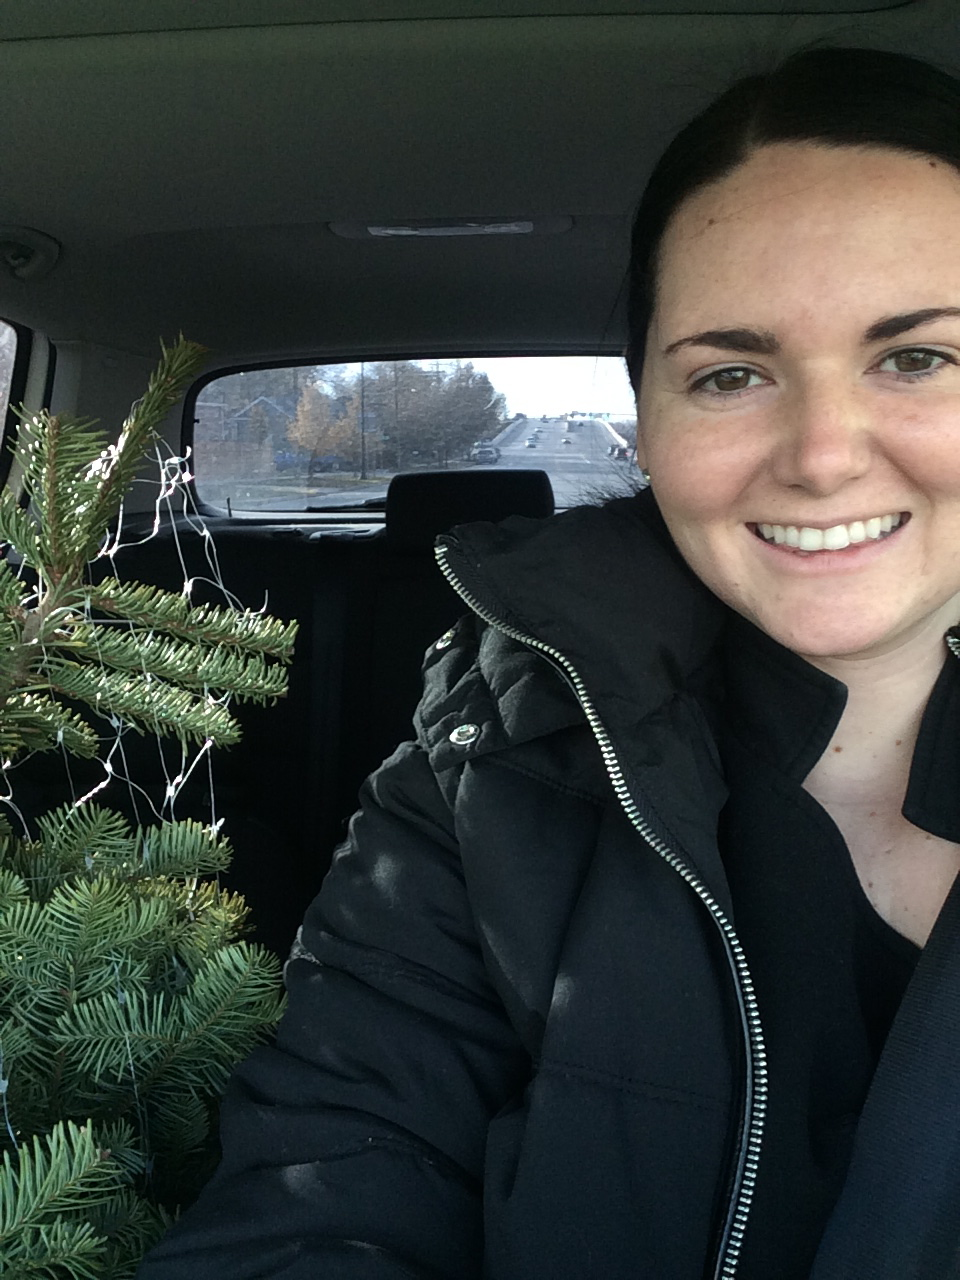 Oh Christmas Tree, Oh Christmas Tree Dec. 6, 2015 858